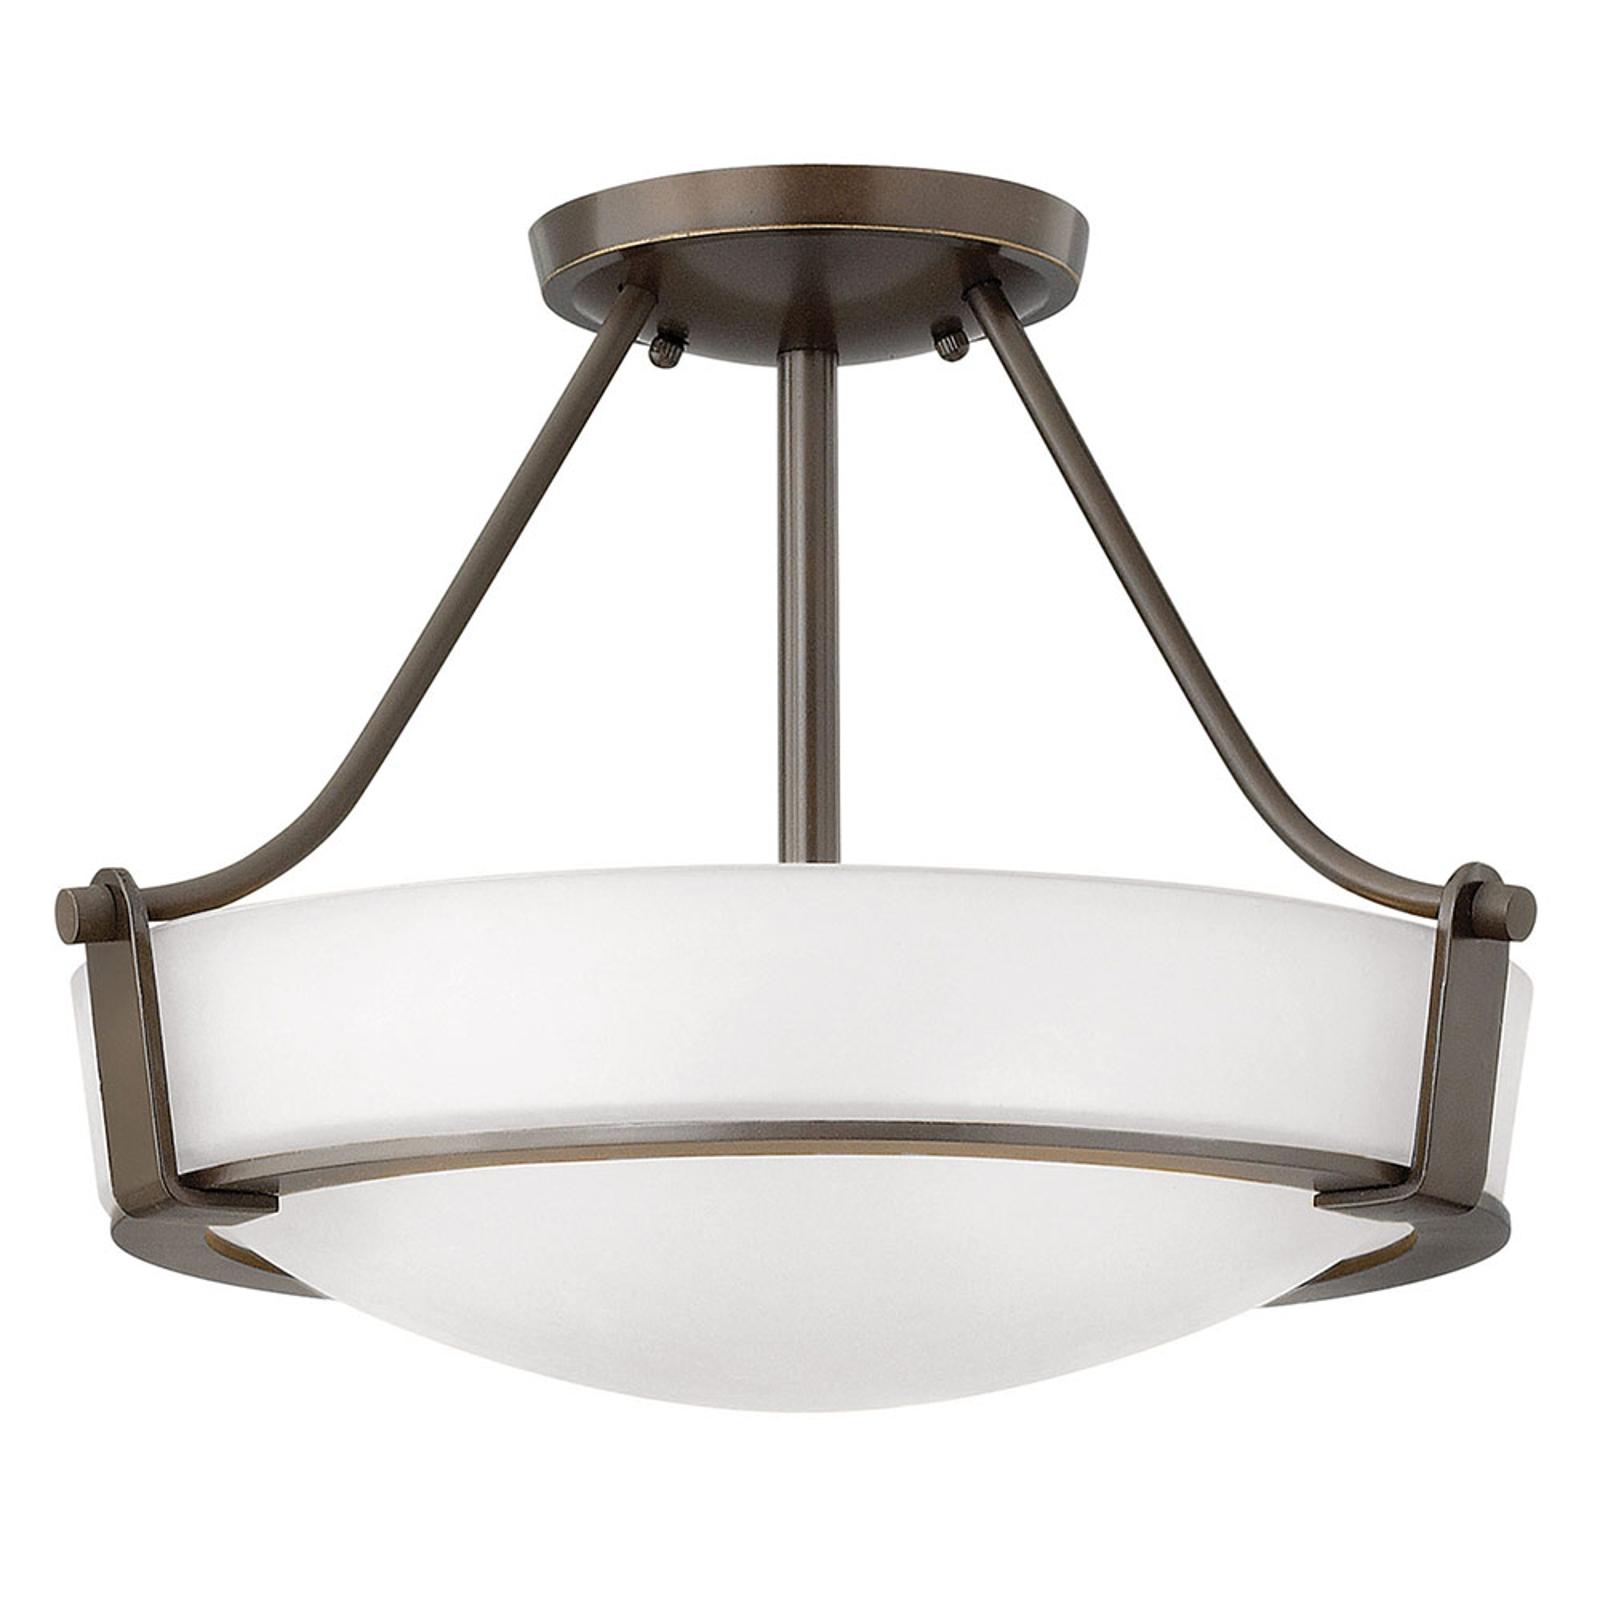 Plafondlamp Hathaway met afstand, brons Ø 41 cm